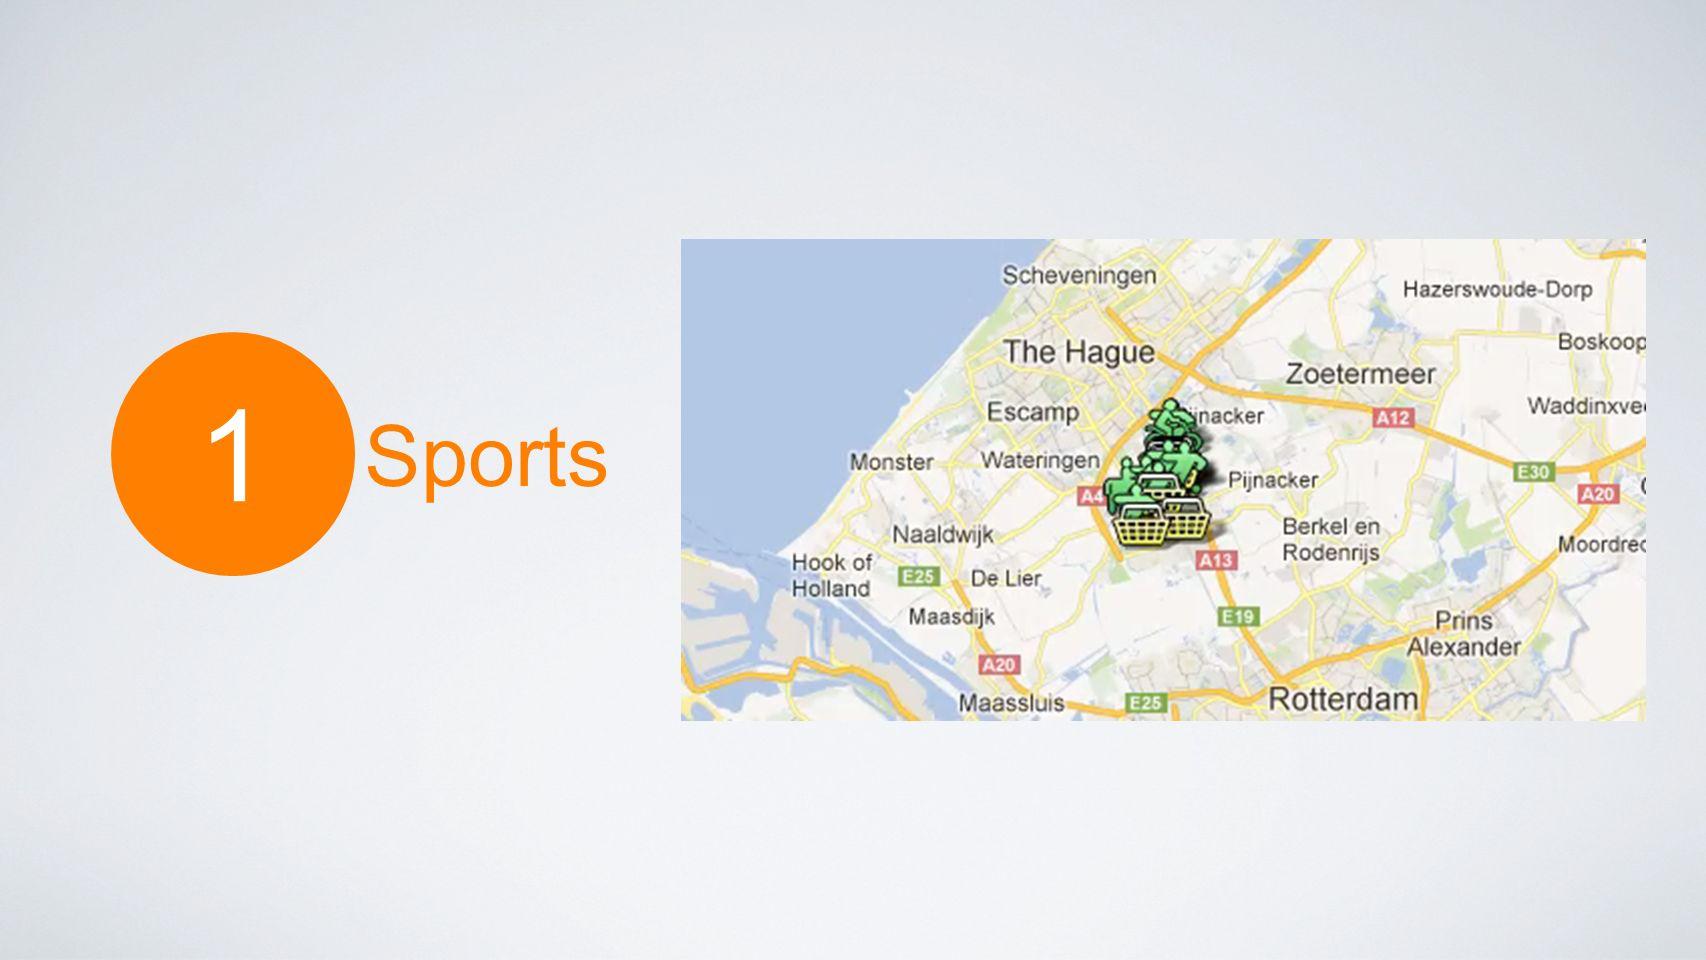 1 Sports